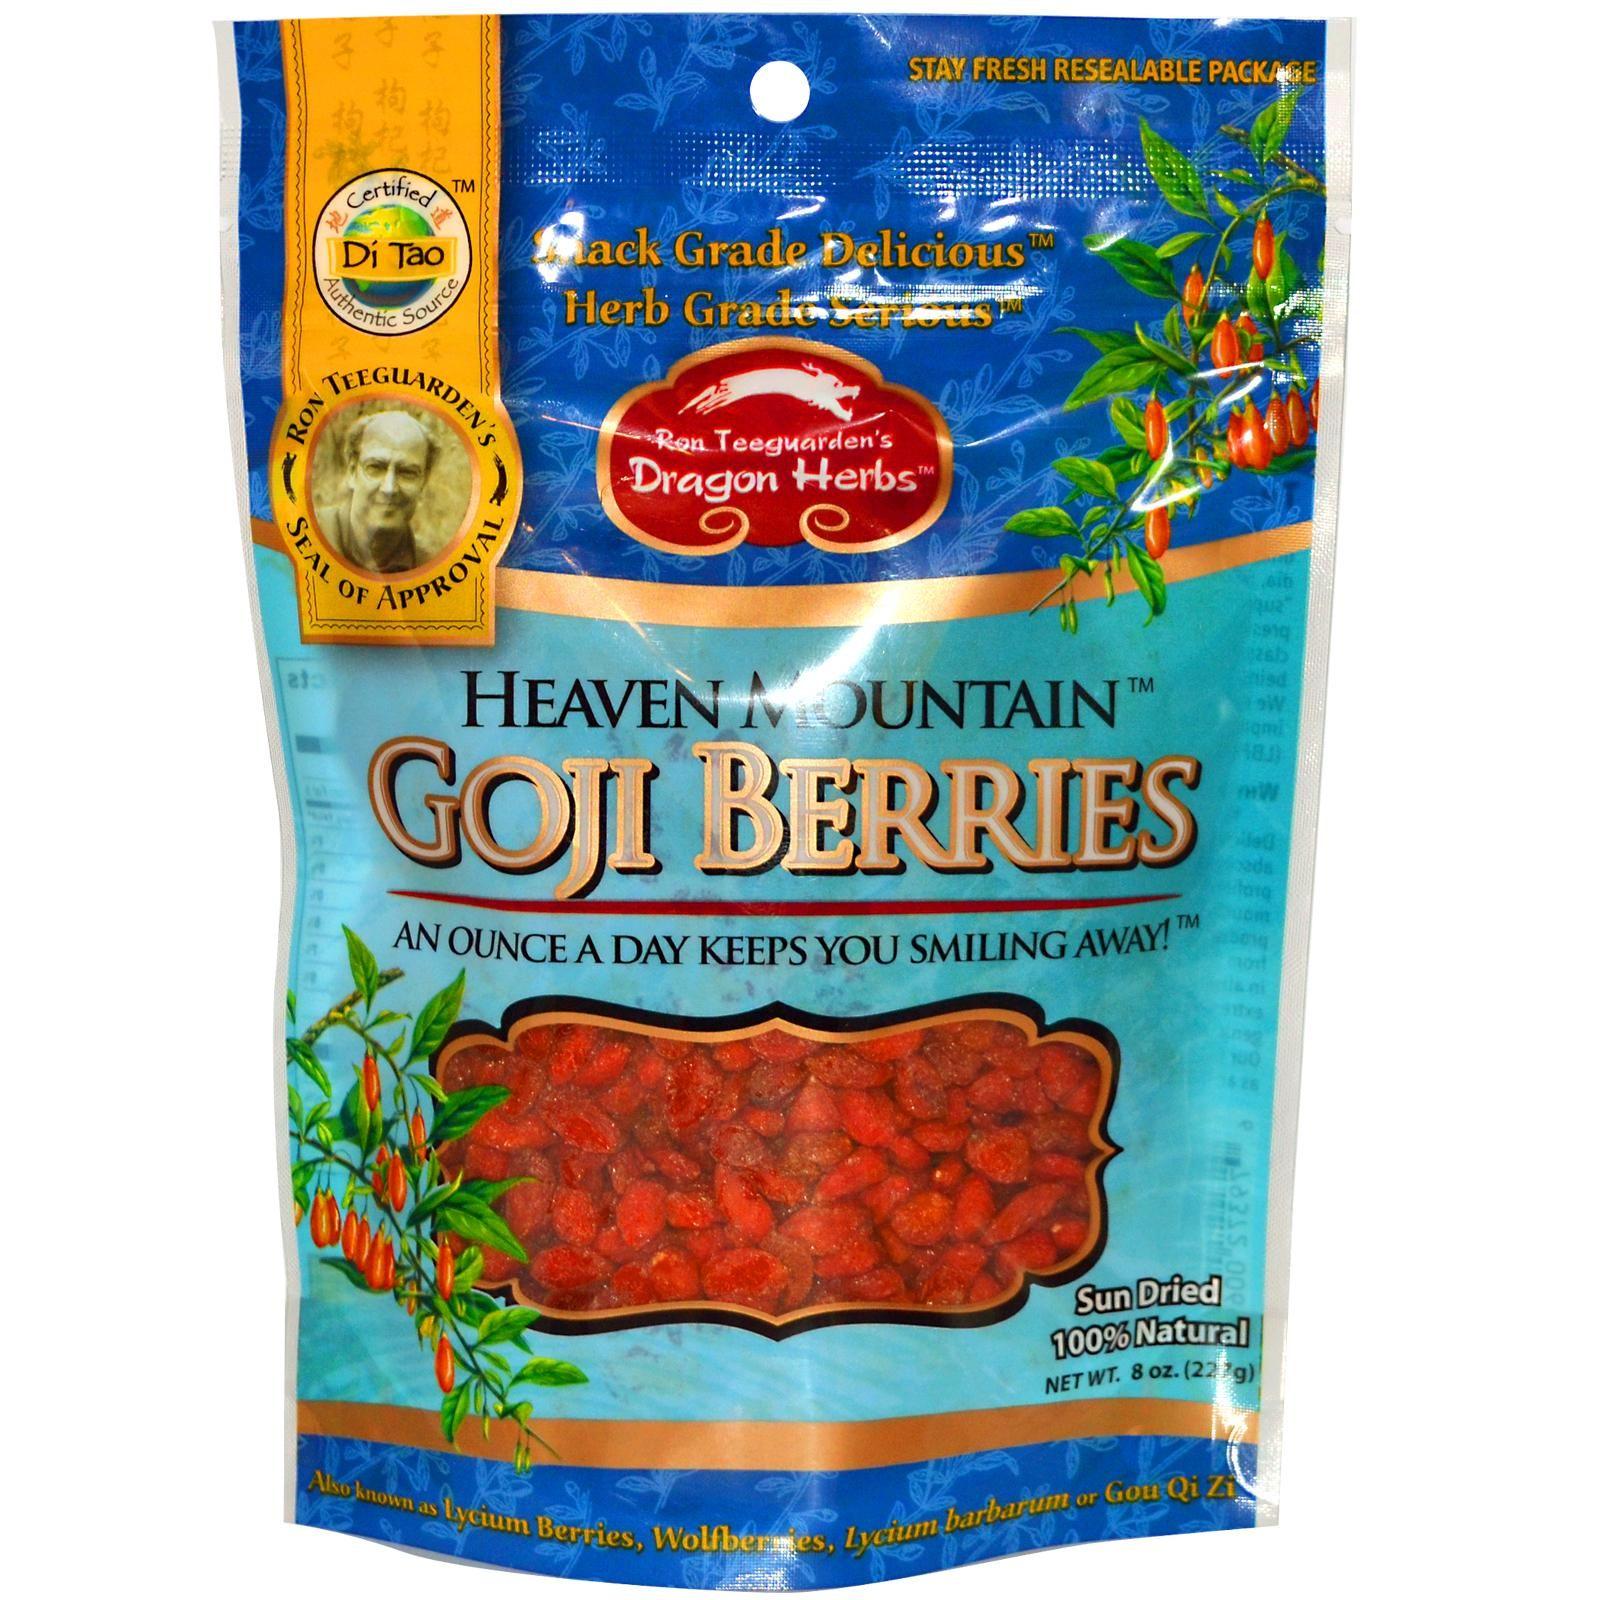 Dragon Herbs, Heaven Mountain Goji Berries, 8 oz (227 g